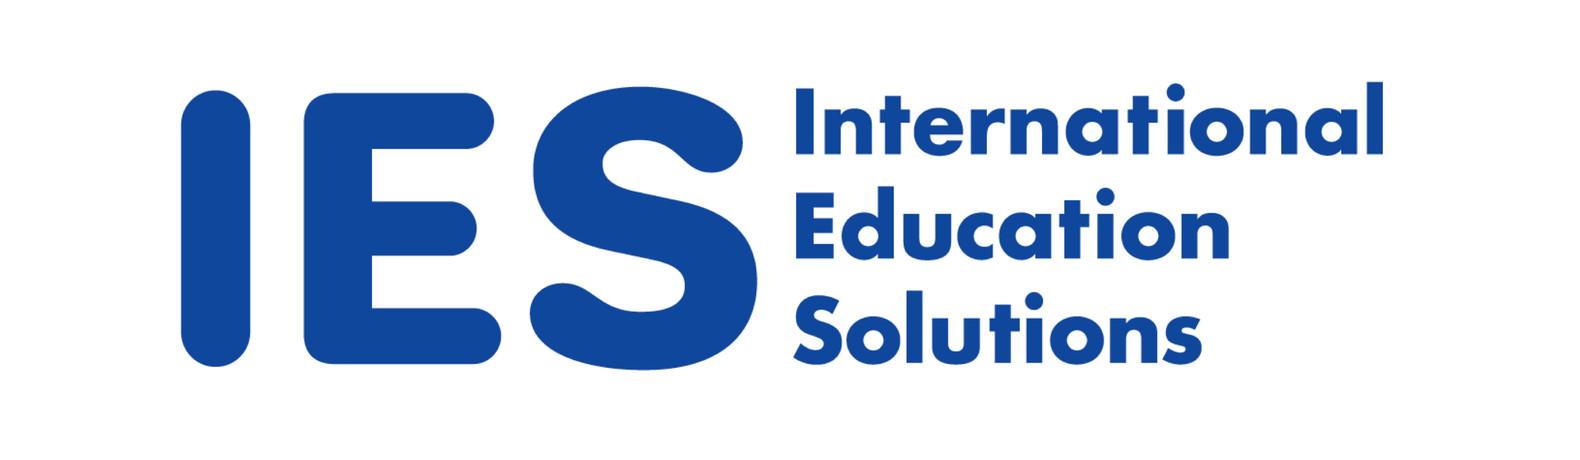 IES - International Education Solutions